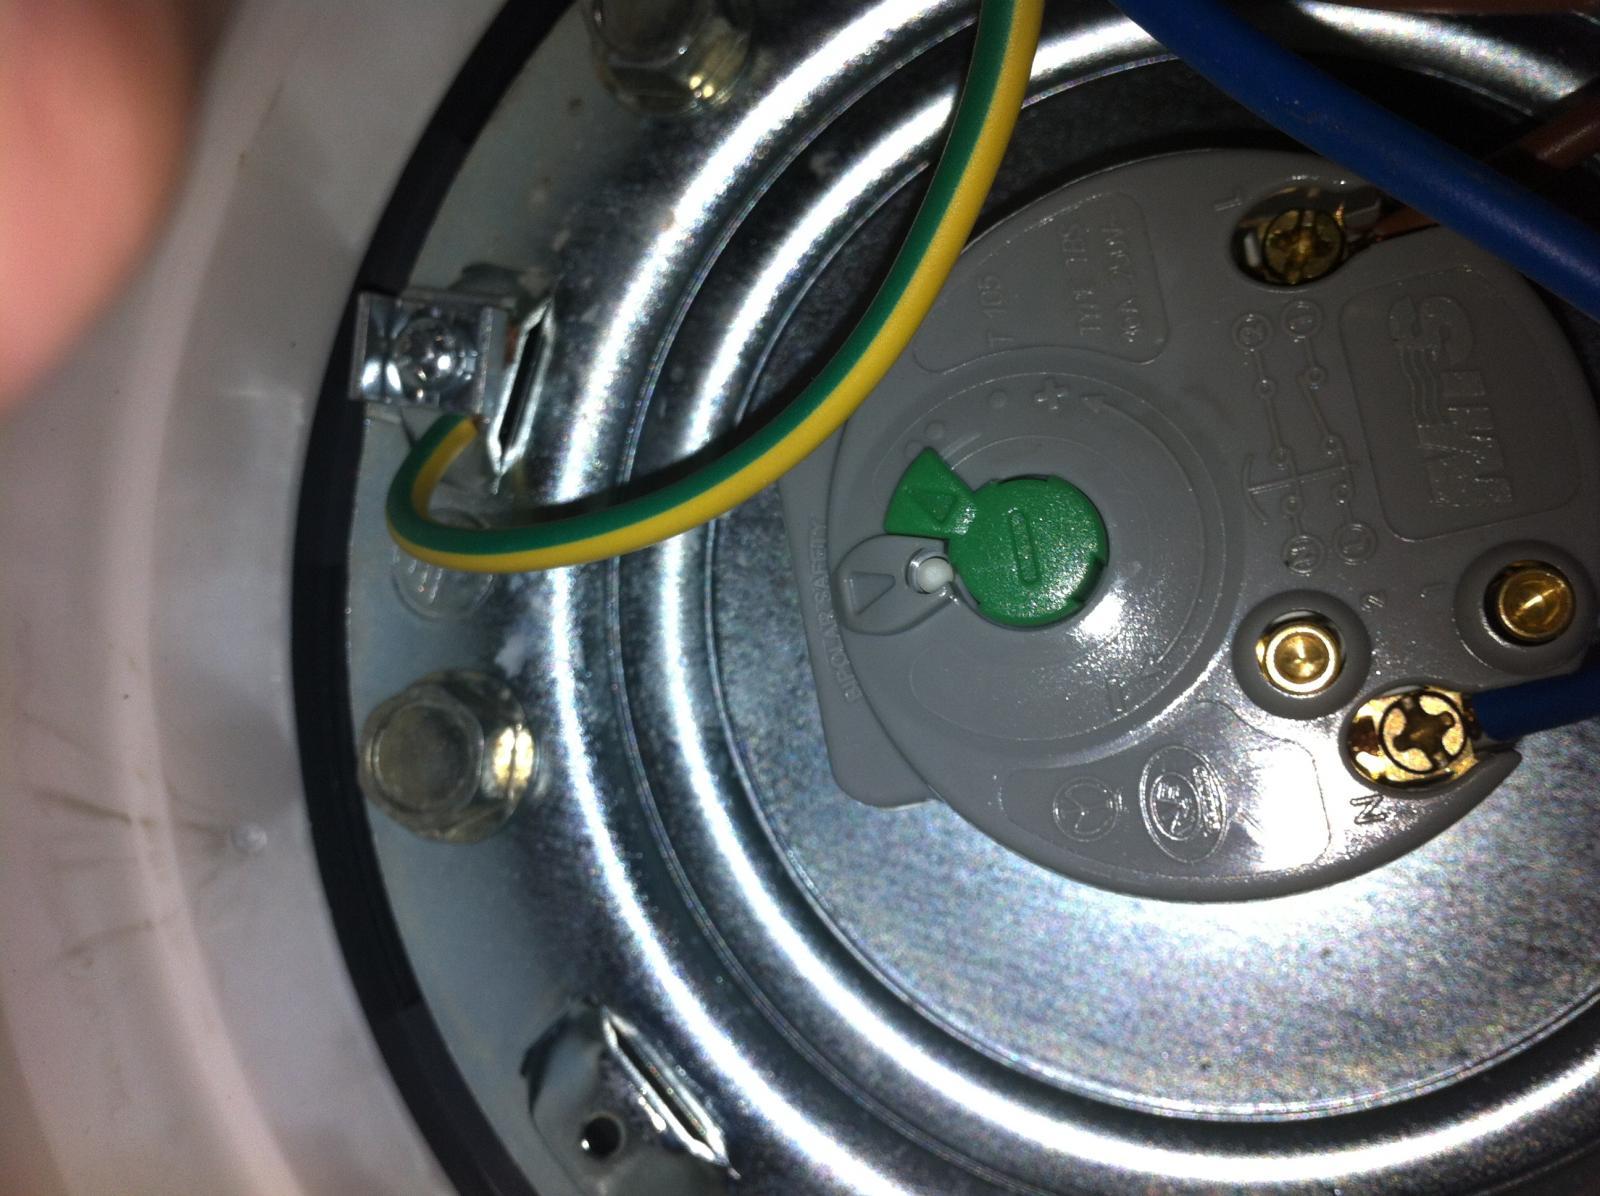 Chauffe eau for Probleme thermostat chauffe eau